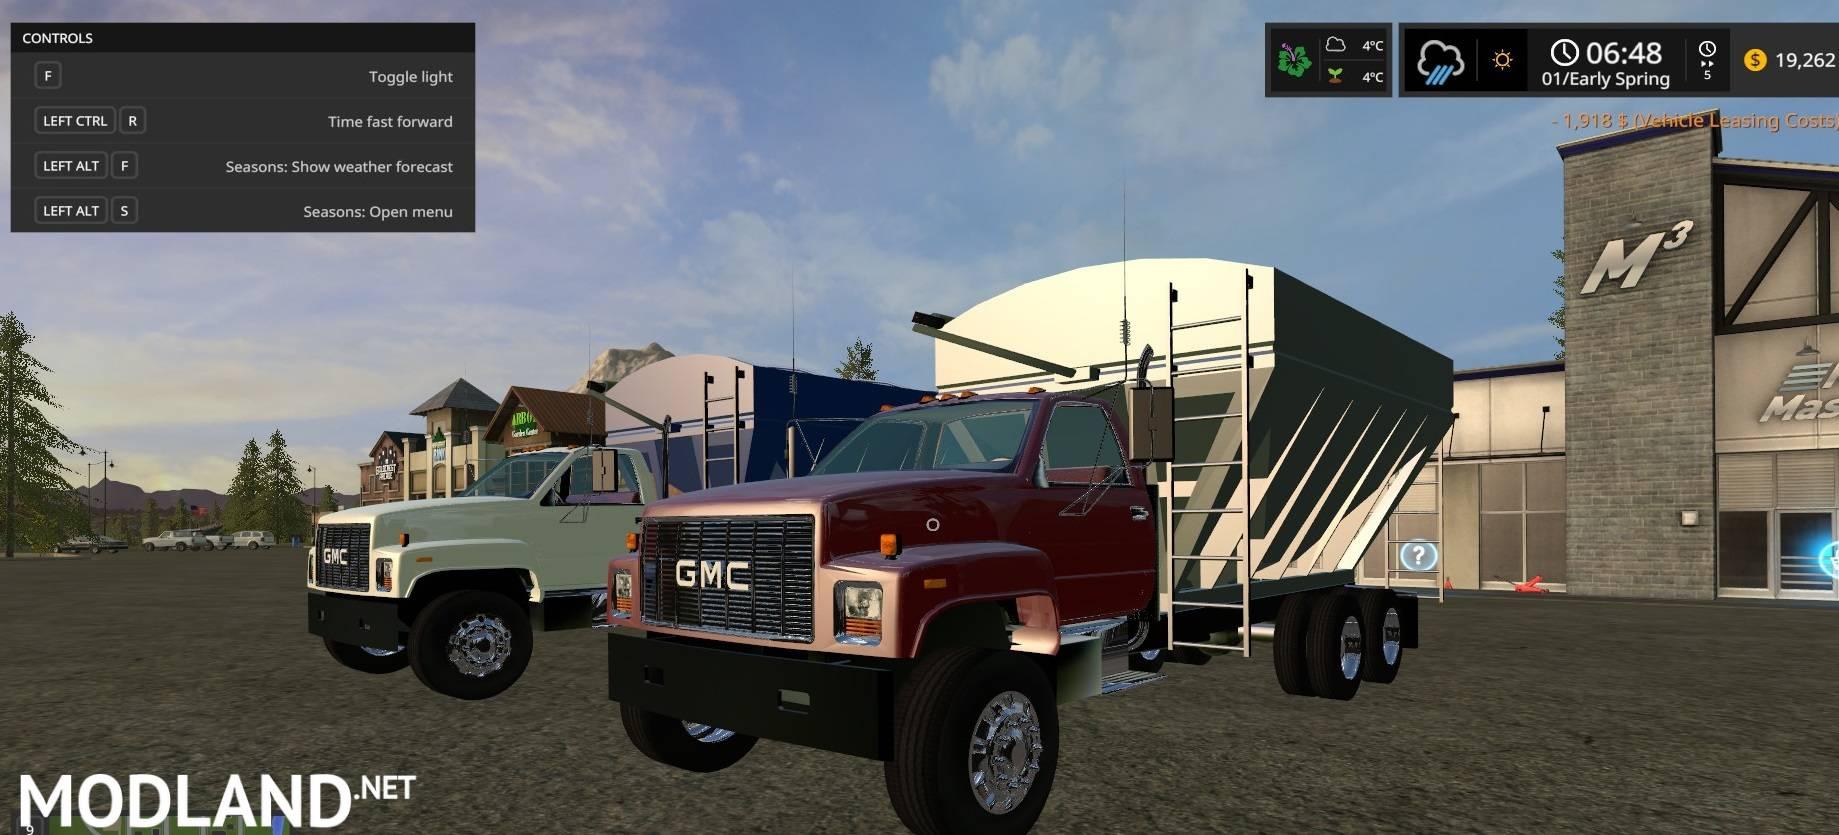 Mack Truck Fertilizer : Gmc seed fertilizer tender truck mod farming simulator